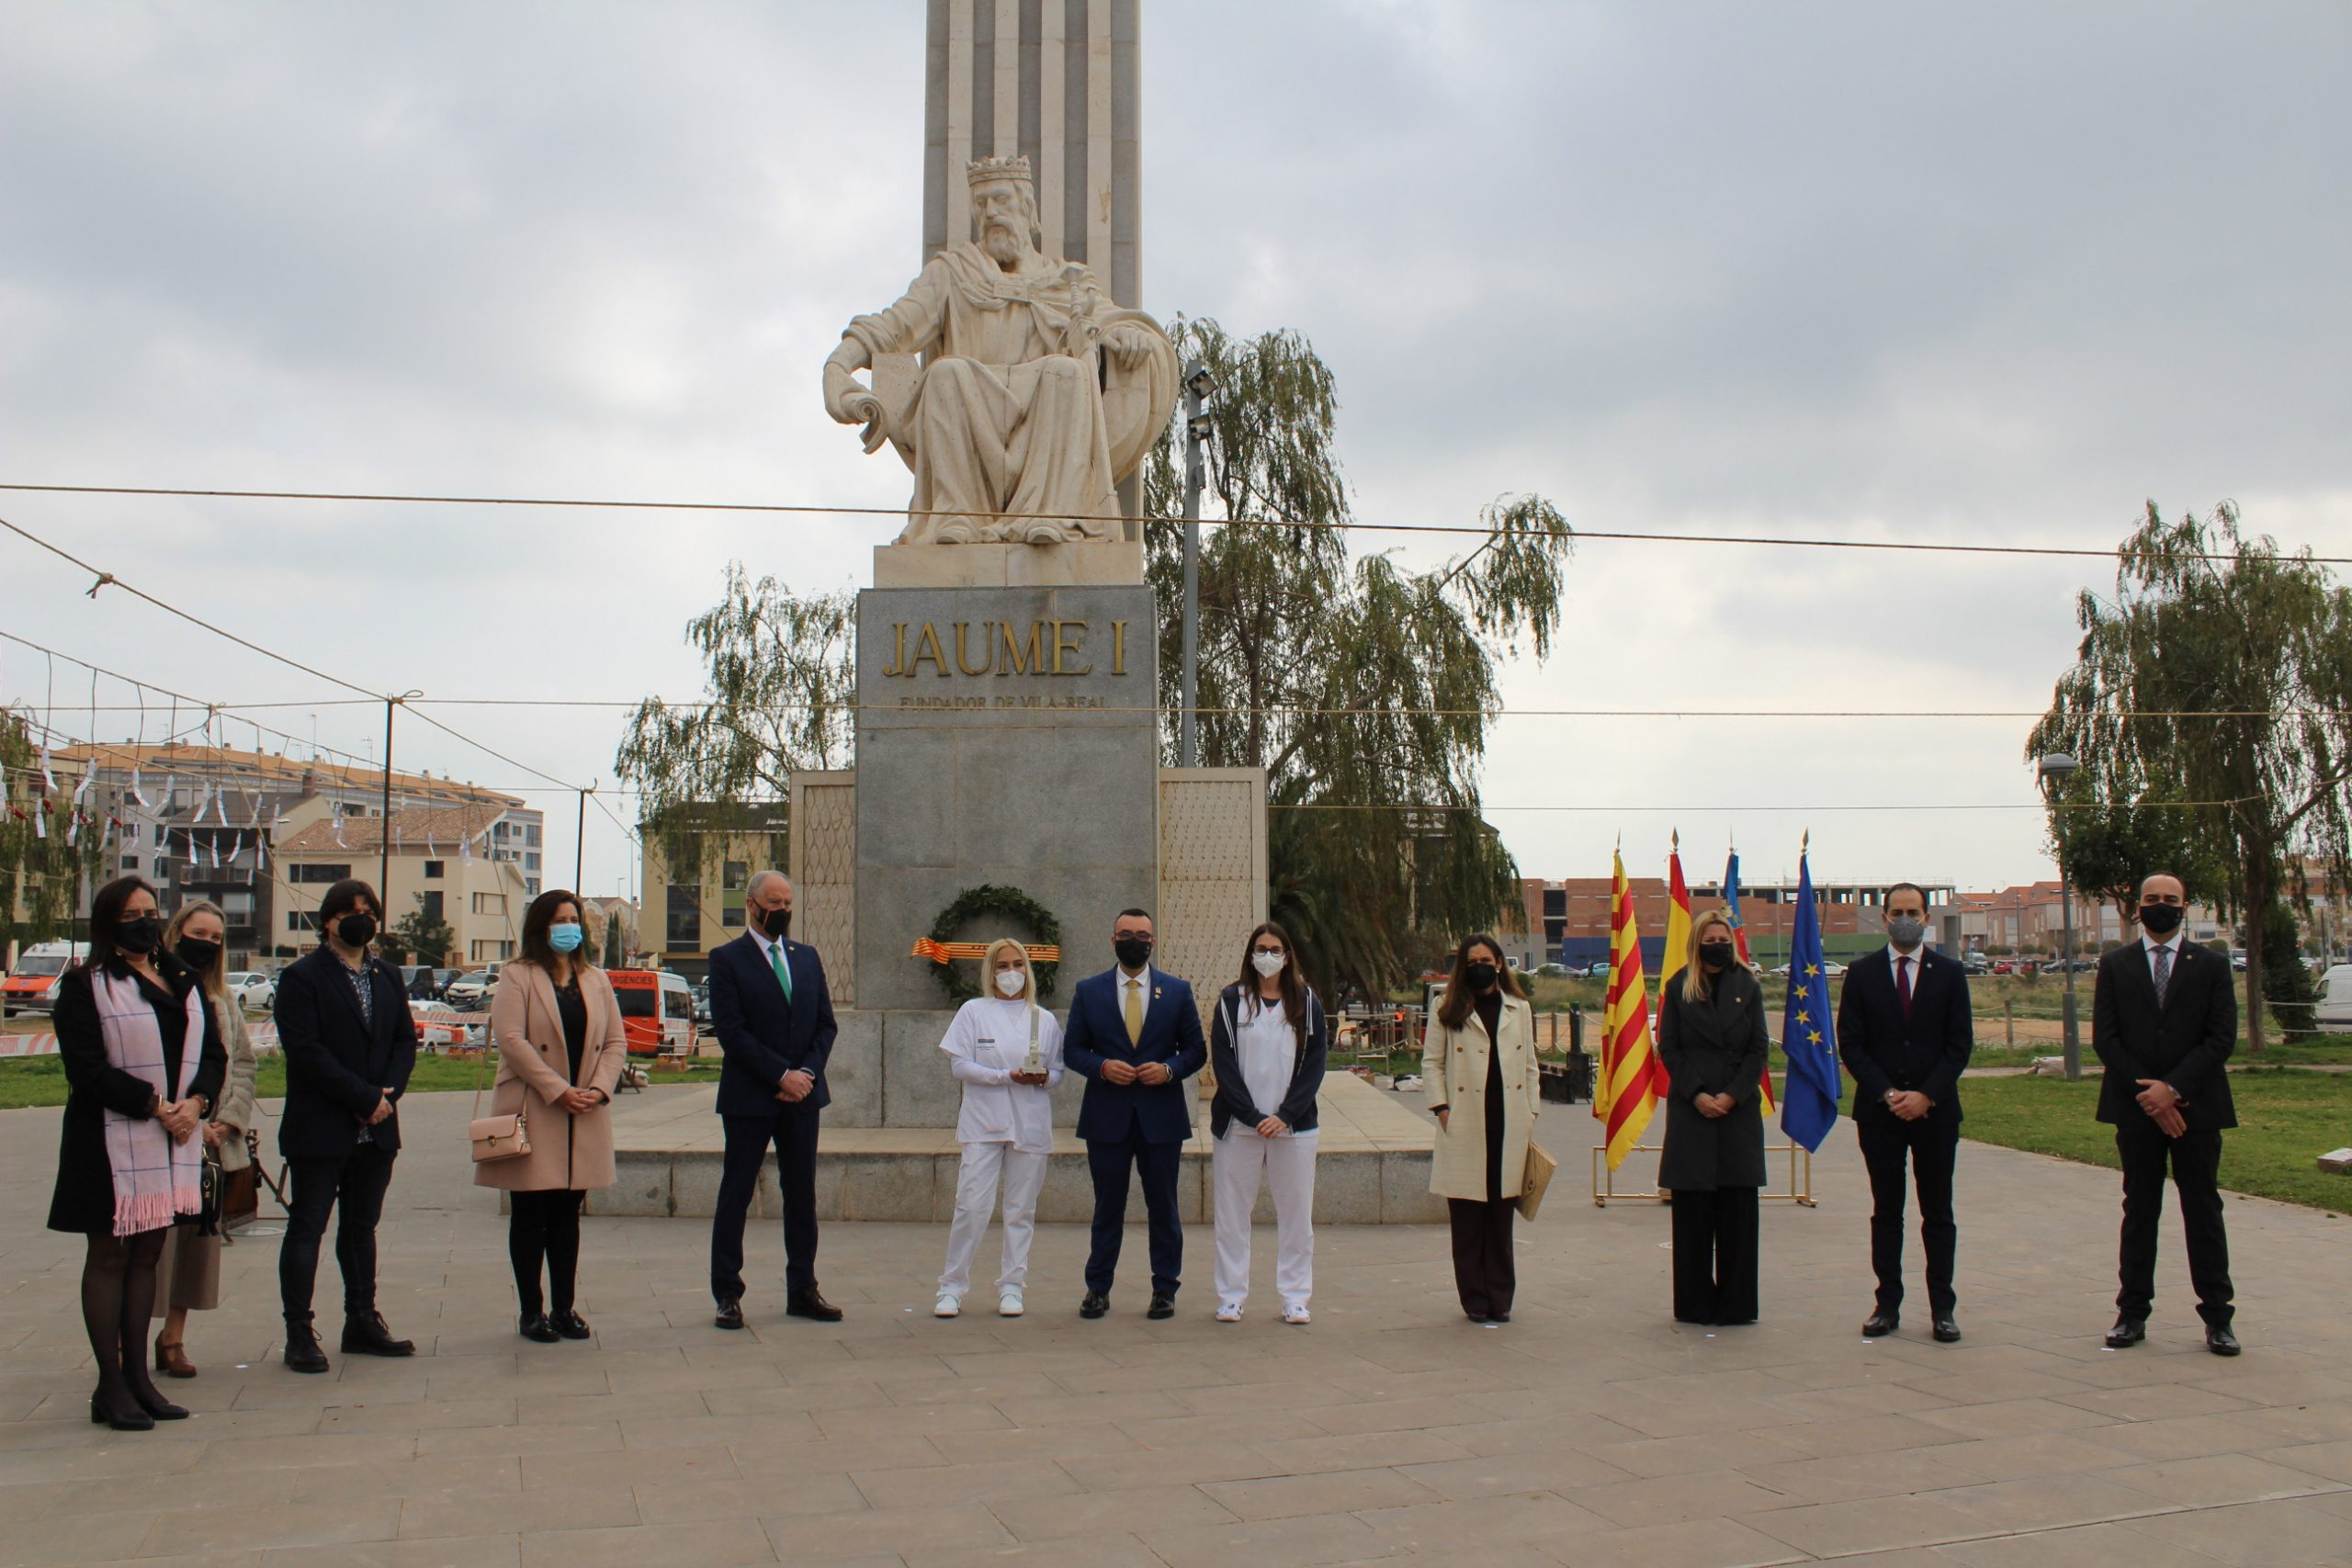 El concurso 'Dibuixem la nostra fundació. 747 anys de Vila-real' recibe 220 trabajos de los estudiantes de Primaria de la ciudad